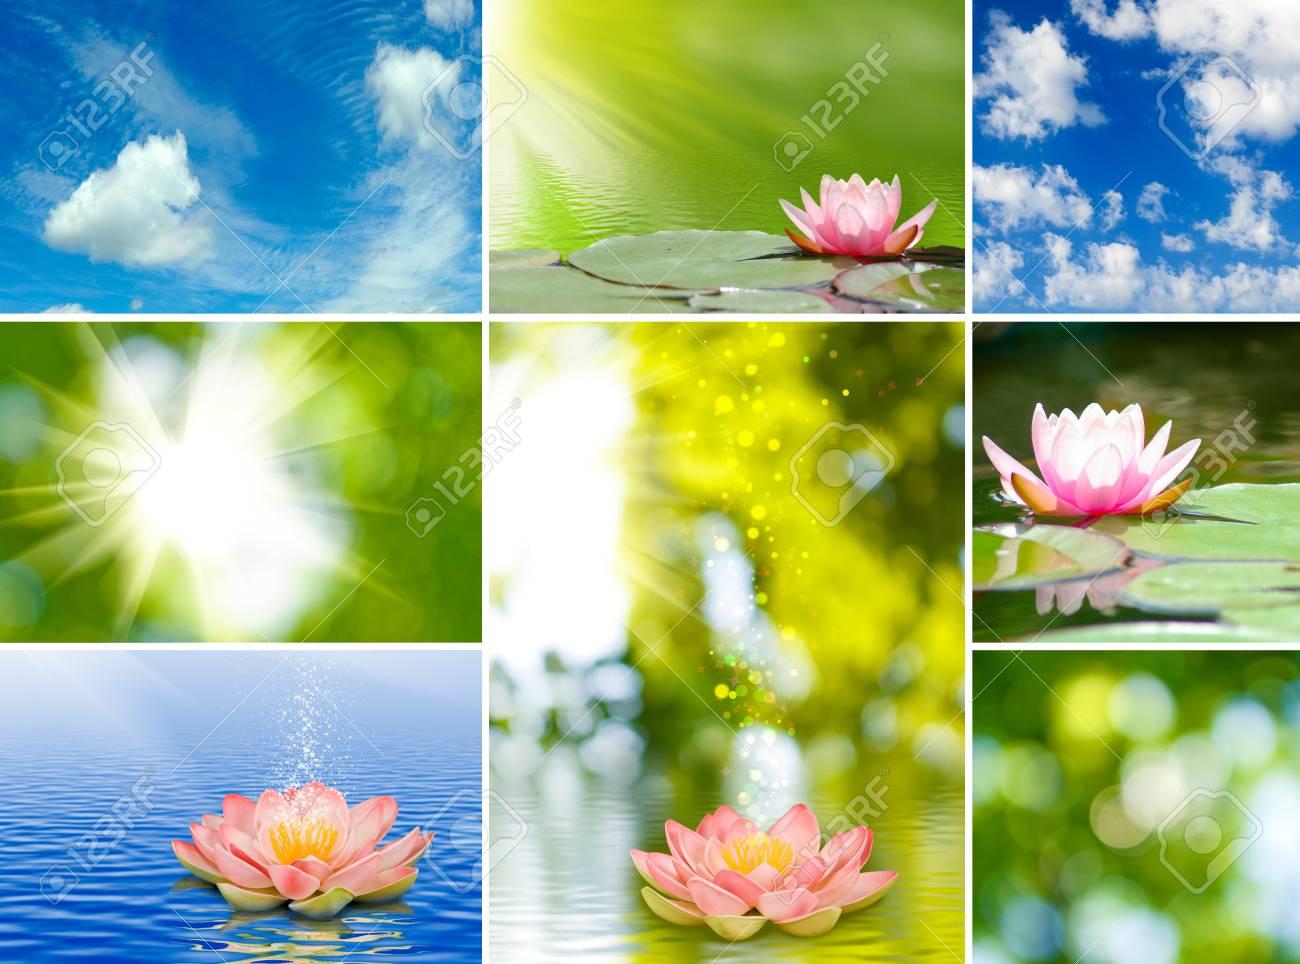 Image of different beautiful flowers stock photo picture and image of different beautiful flowers stock photo 33921648 izmirmasajfo